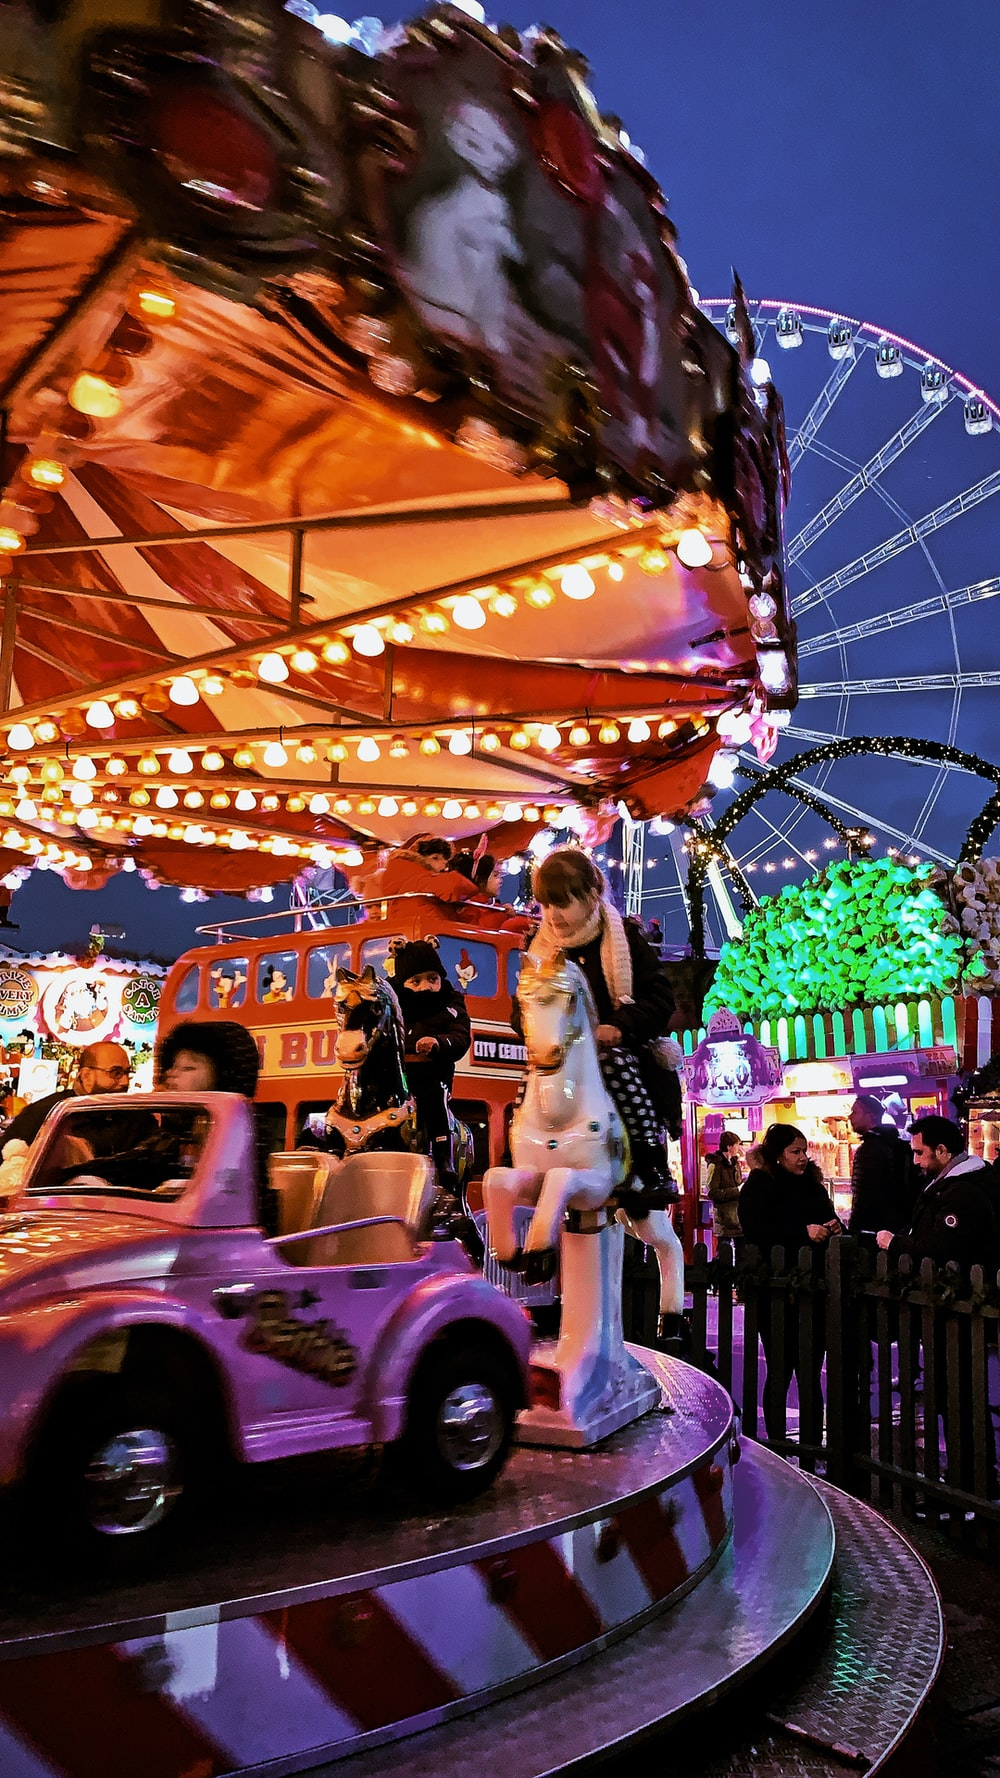 people riding on carousel during daytime